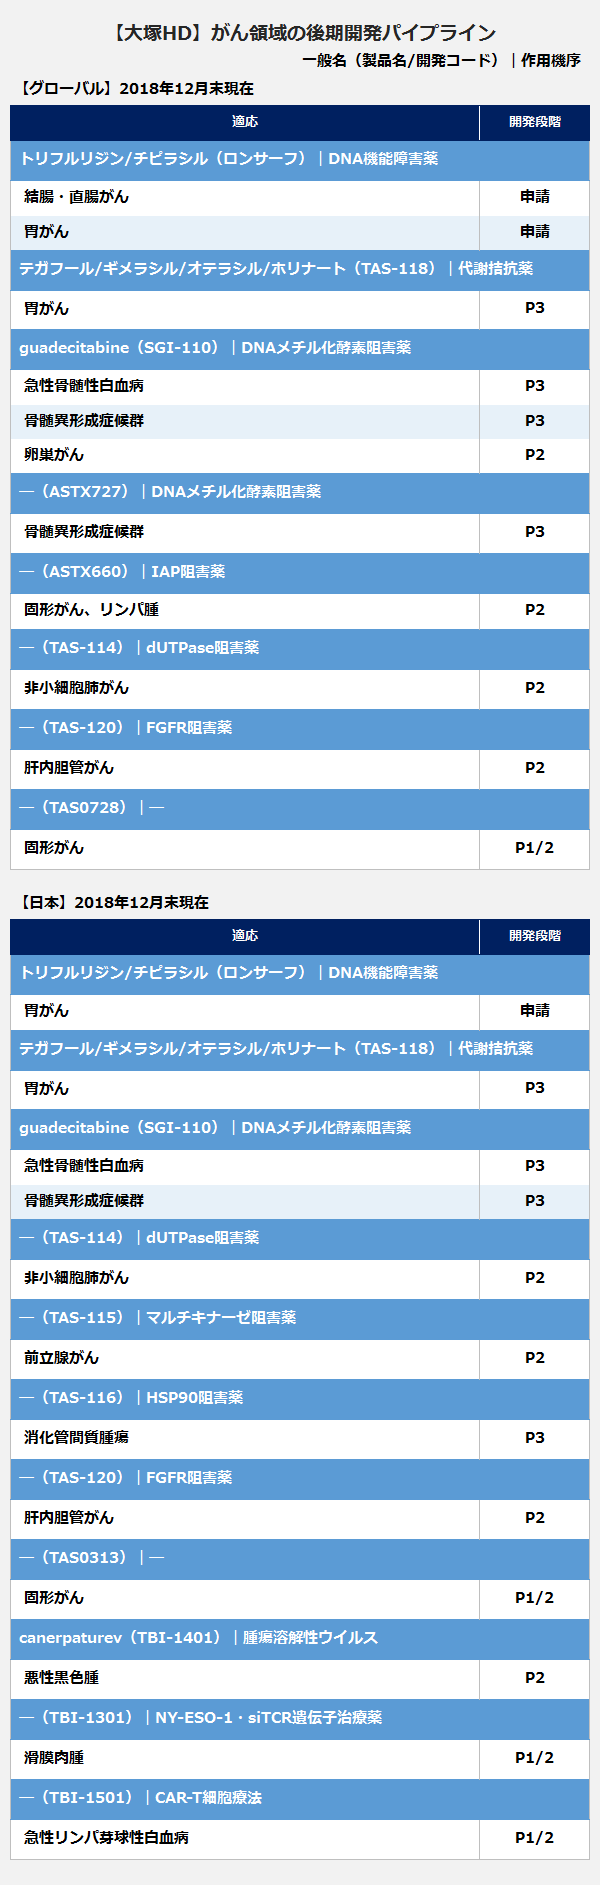 CancerPipeline5_Otsuka1904 (1)